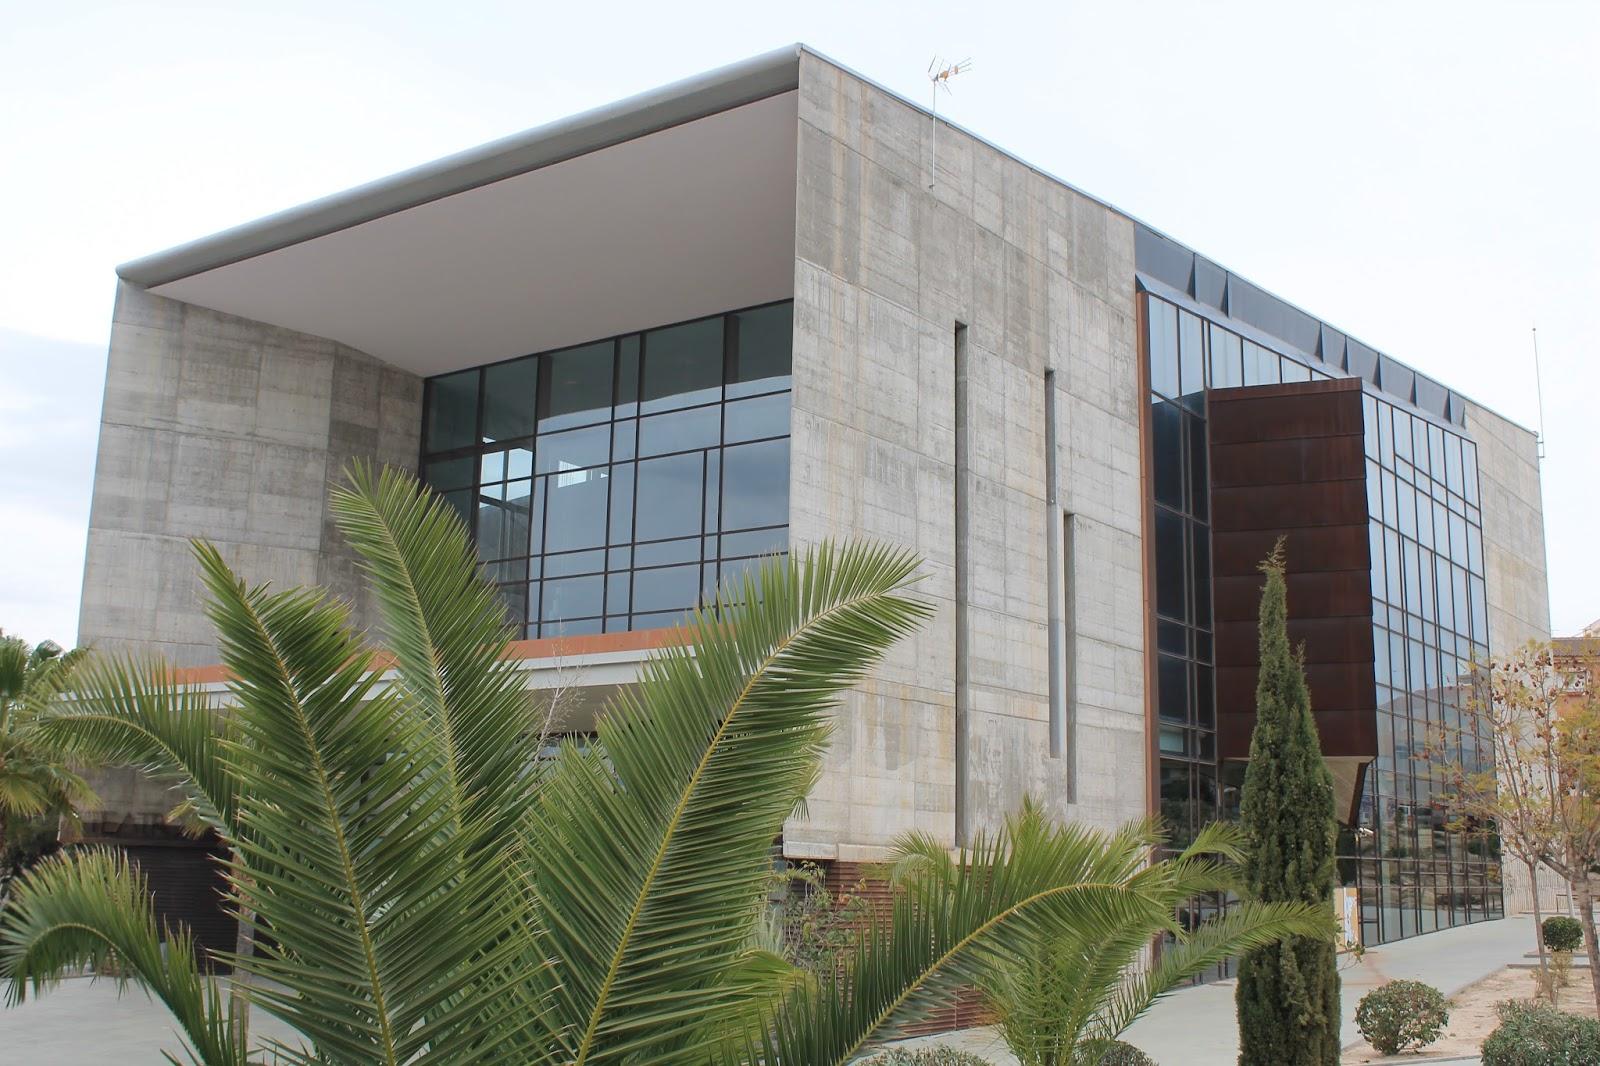 A diez minutos del centro 188 molina de segura centro for Piscina municipal molina de segura